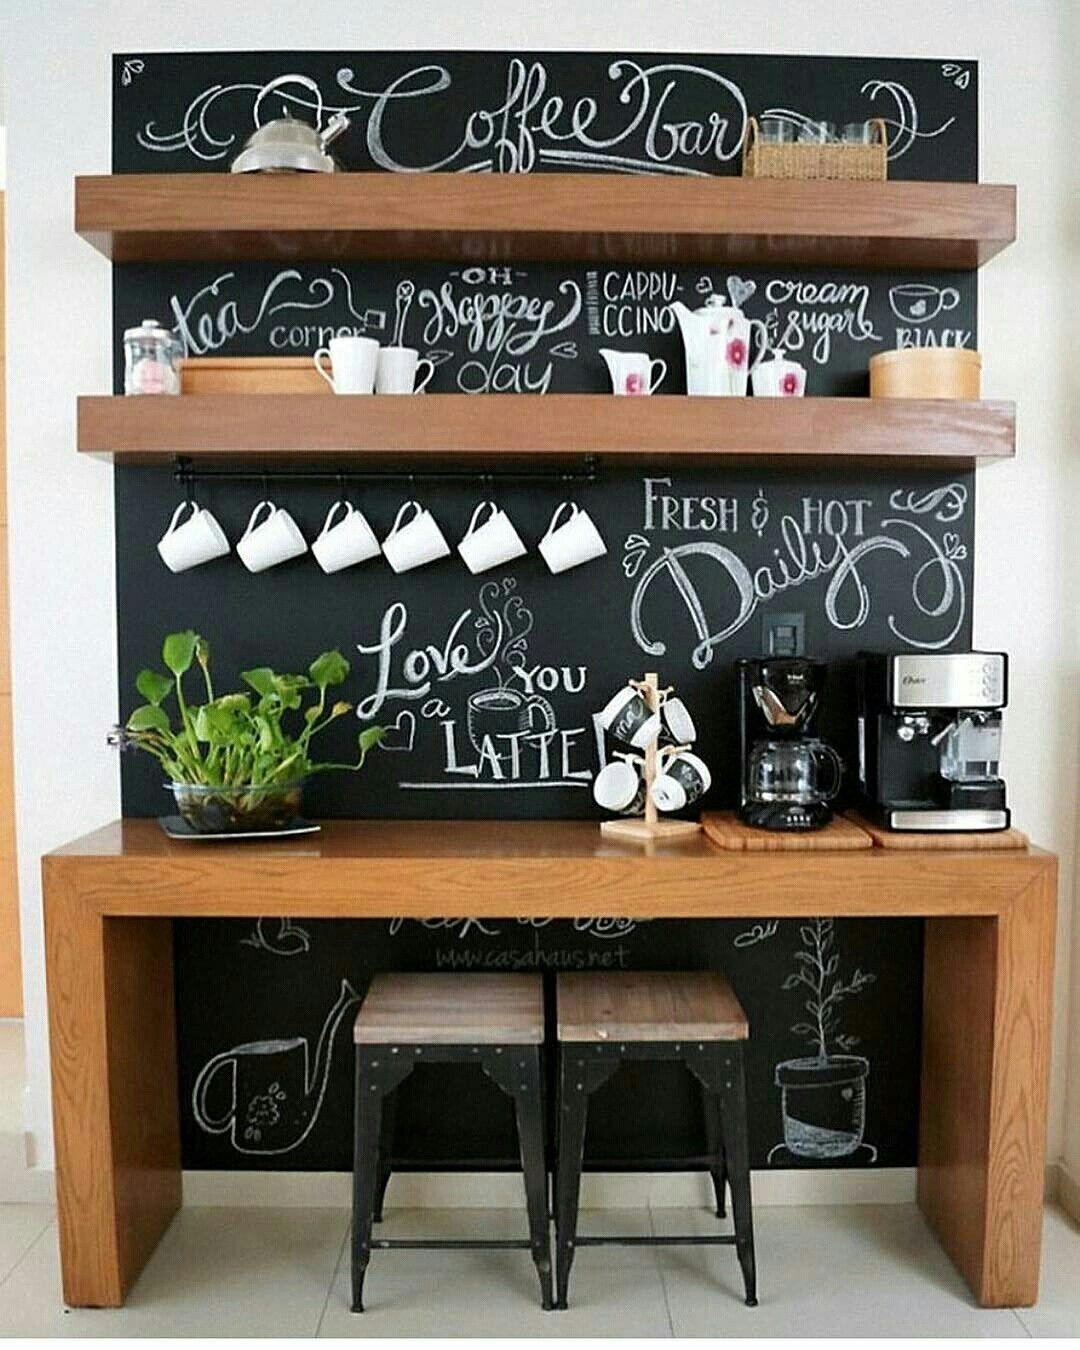 un coffee corner dans la cuisine  Coin café cuisine, Bar cuisine